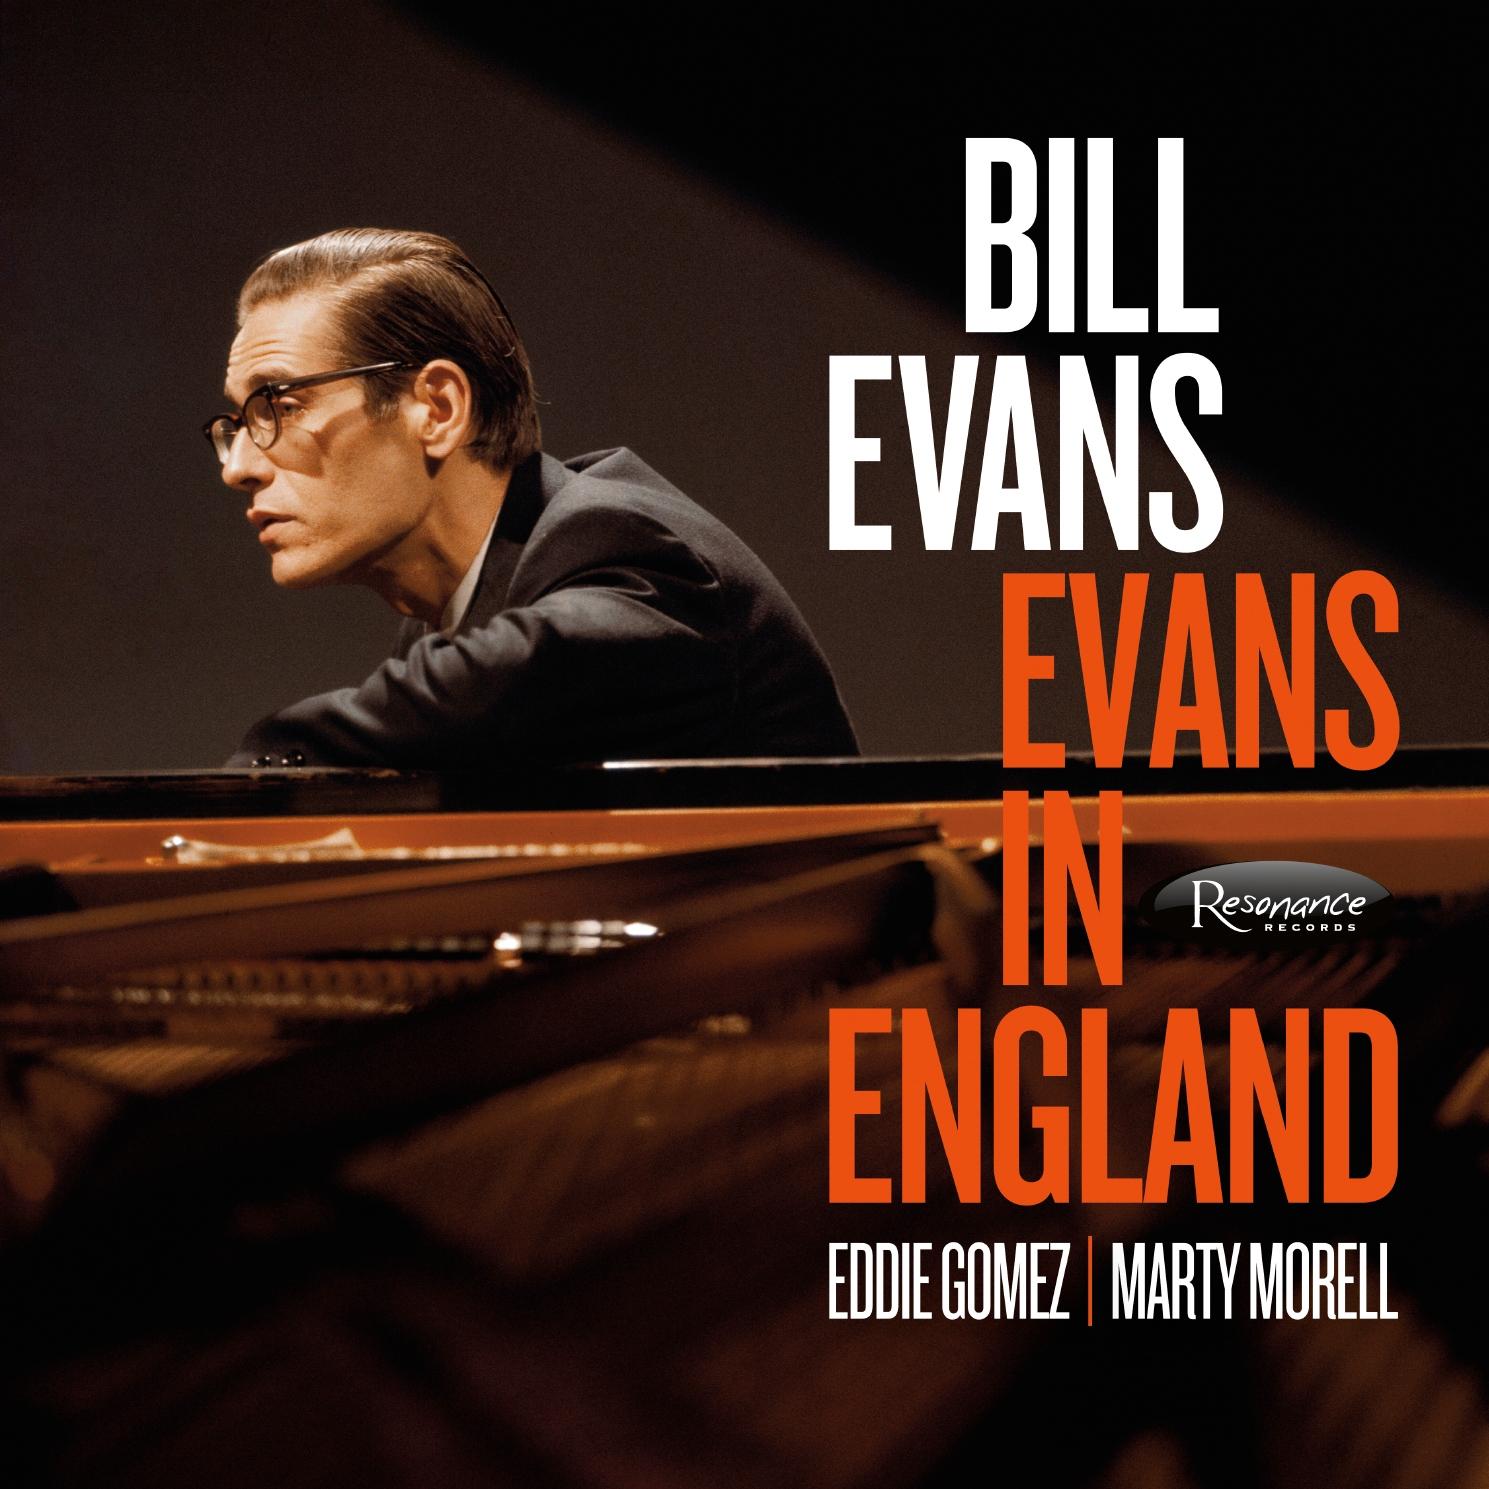 BILL EVANS | 'Evans in England'